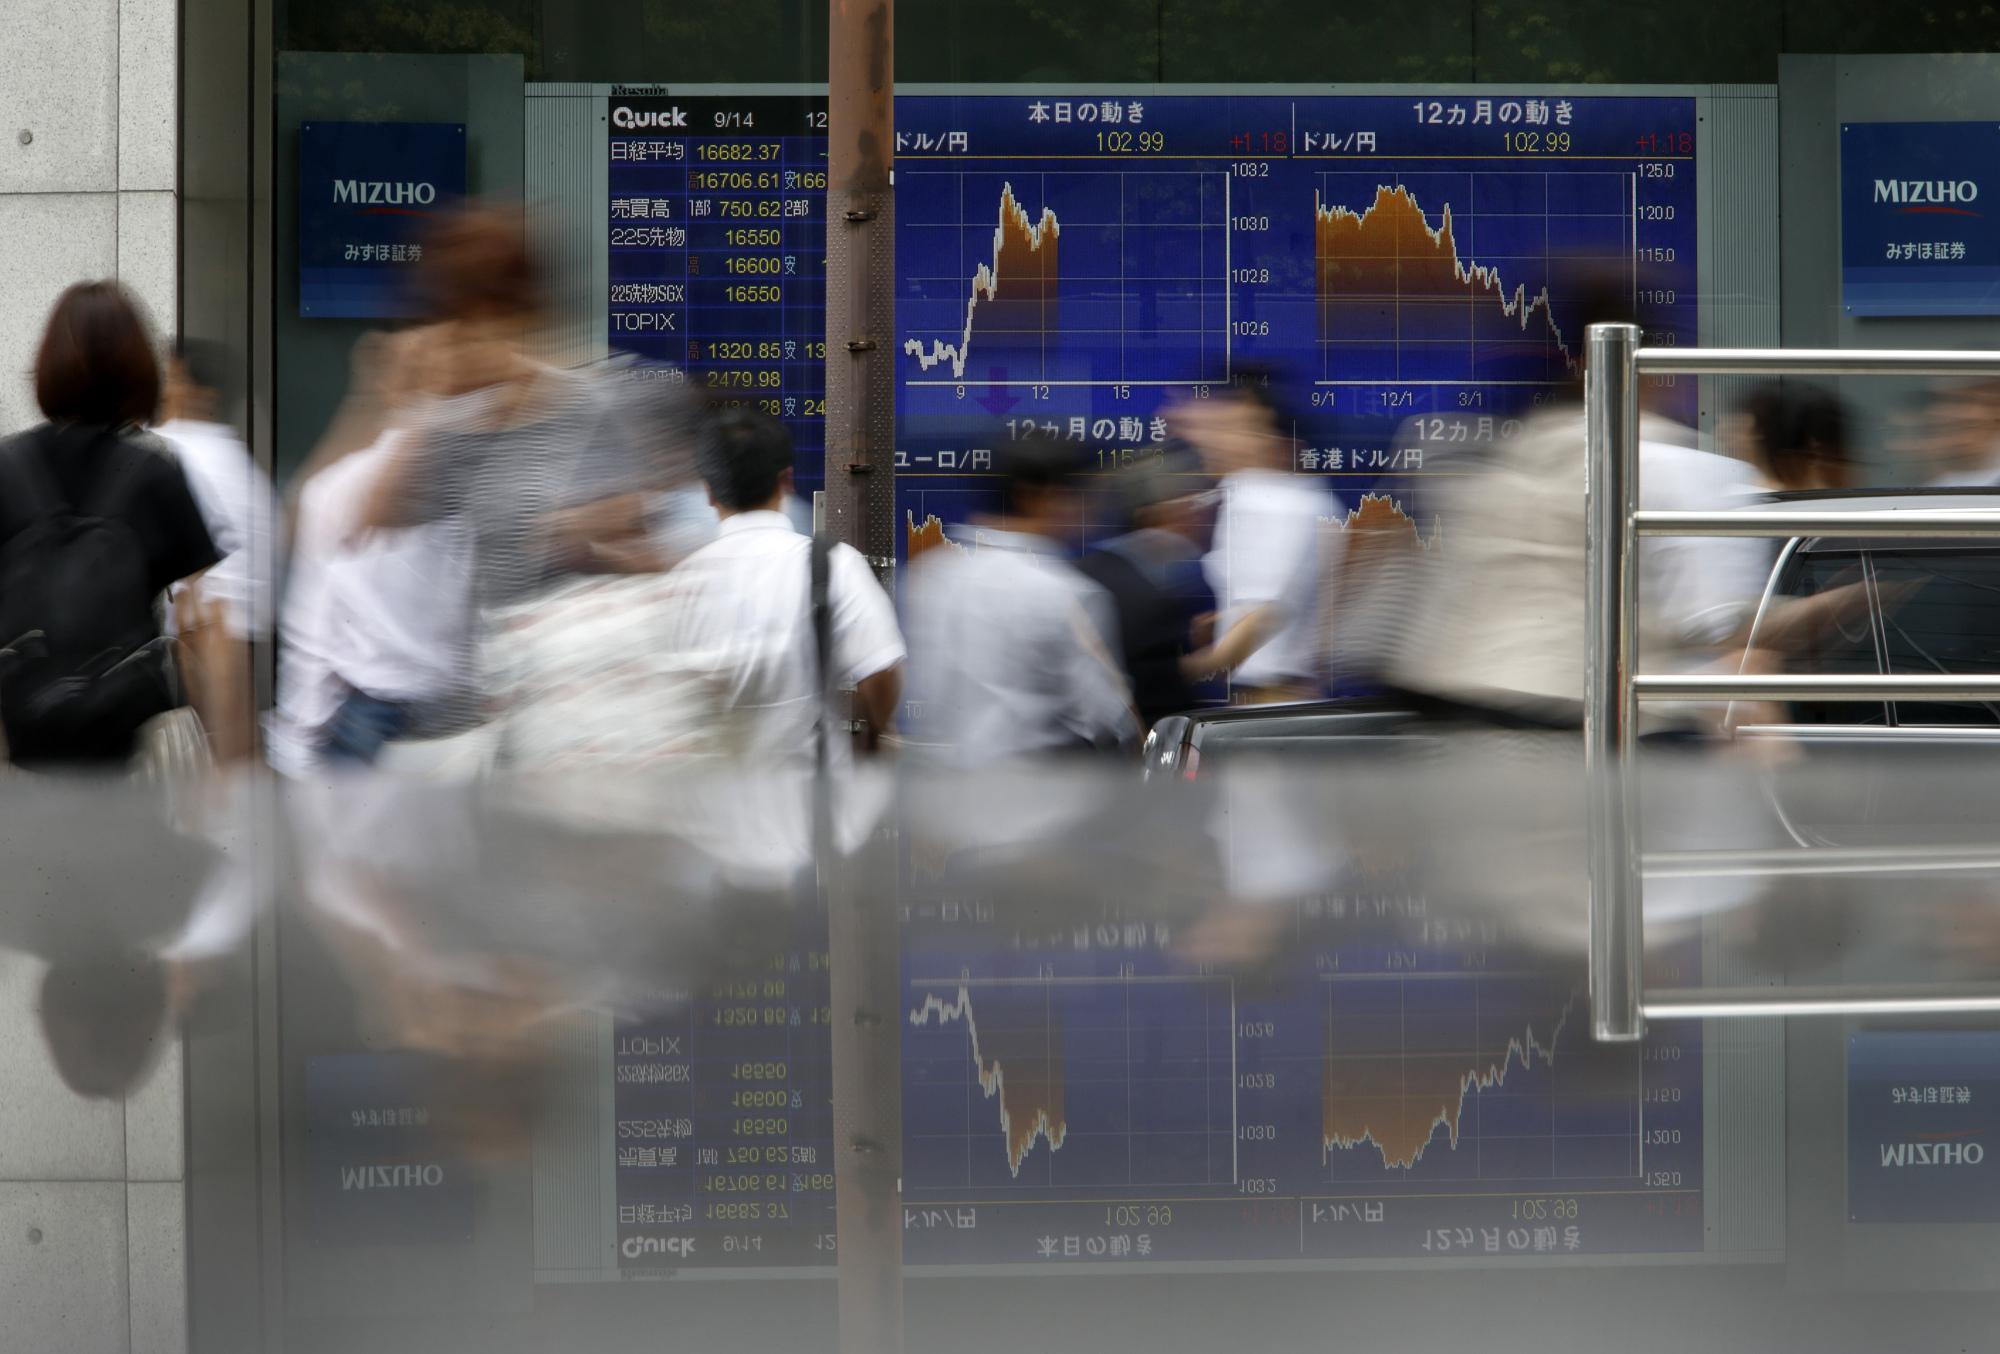 bloomberg.com - Andreea Papuc - U.S. Stock Futures Drop as Trump Readies Tariffs: Markets Wrap